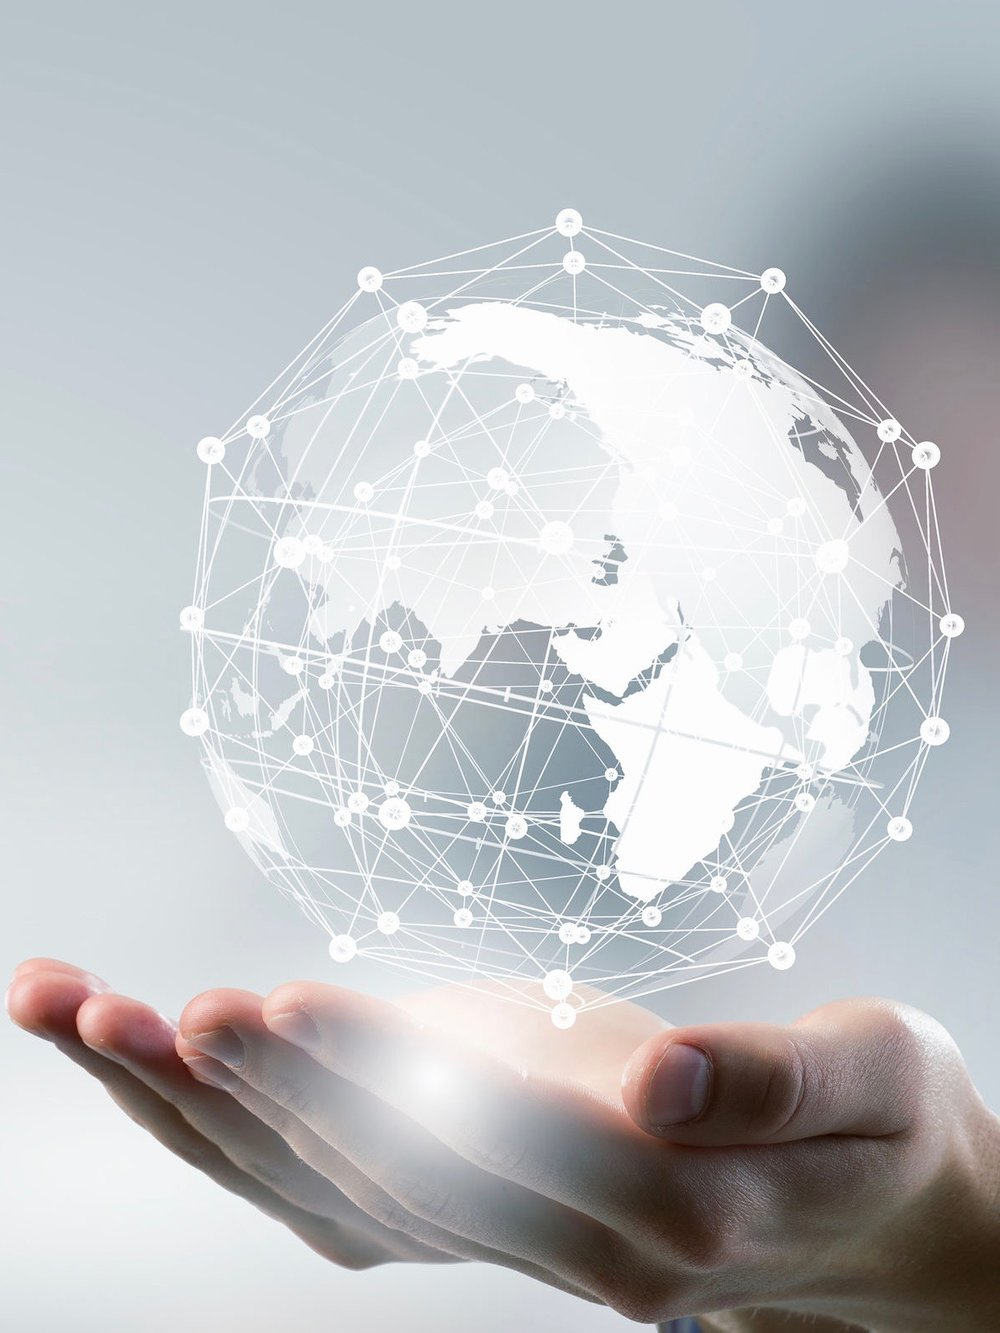 - SERVICES量子化学計算、機械学習、最適化の分野にフォーカスし、パートナーとなる企業様と連携しながら、既存のテクノロジーで解決が困難であった社会および産業の課題を解決します。量子コンピュータという新たな革新的なデバイスの潜在能力を最大化するためには、業界のパートナーの知見とQunaSysが有する量子技術に関する最先端の知見を組み合わせていくことが重要です。QunaSysはパートナーとなる企業様との協業により、量子コンピュータの最初の応用先として期待されている量子化学計算、機械学習、最適化の分野で、社会および産業の課題を解決していきます。また、既存の計算機とは全く違うアルゴリズムで動くこのデバイスを使いこなし、実用的な量子コンピュータの登場時に活用のスタートダッシュを切れるようにする準備をサポートします。